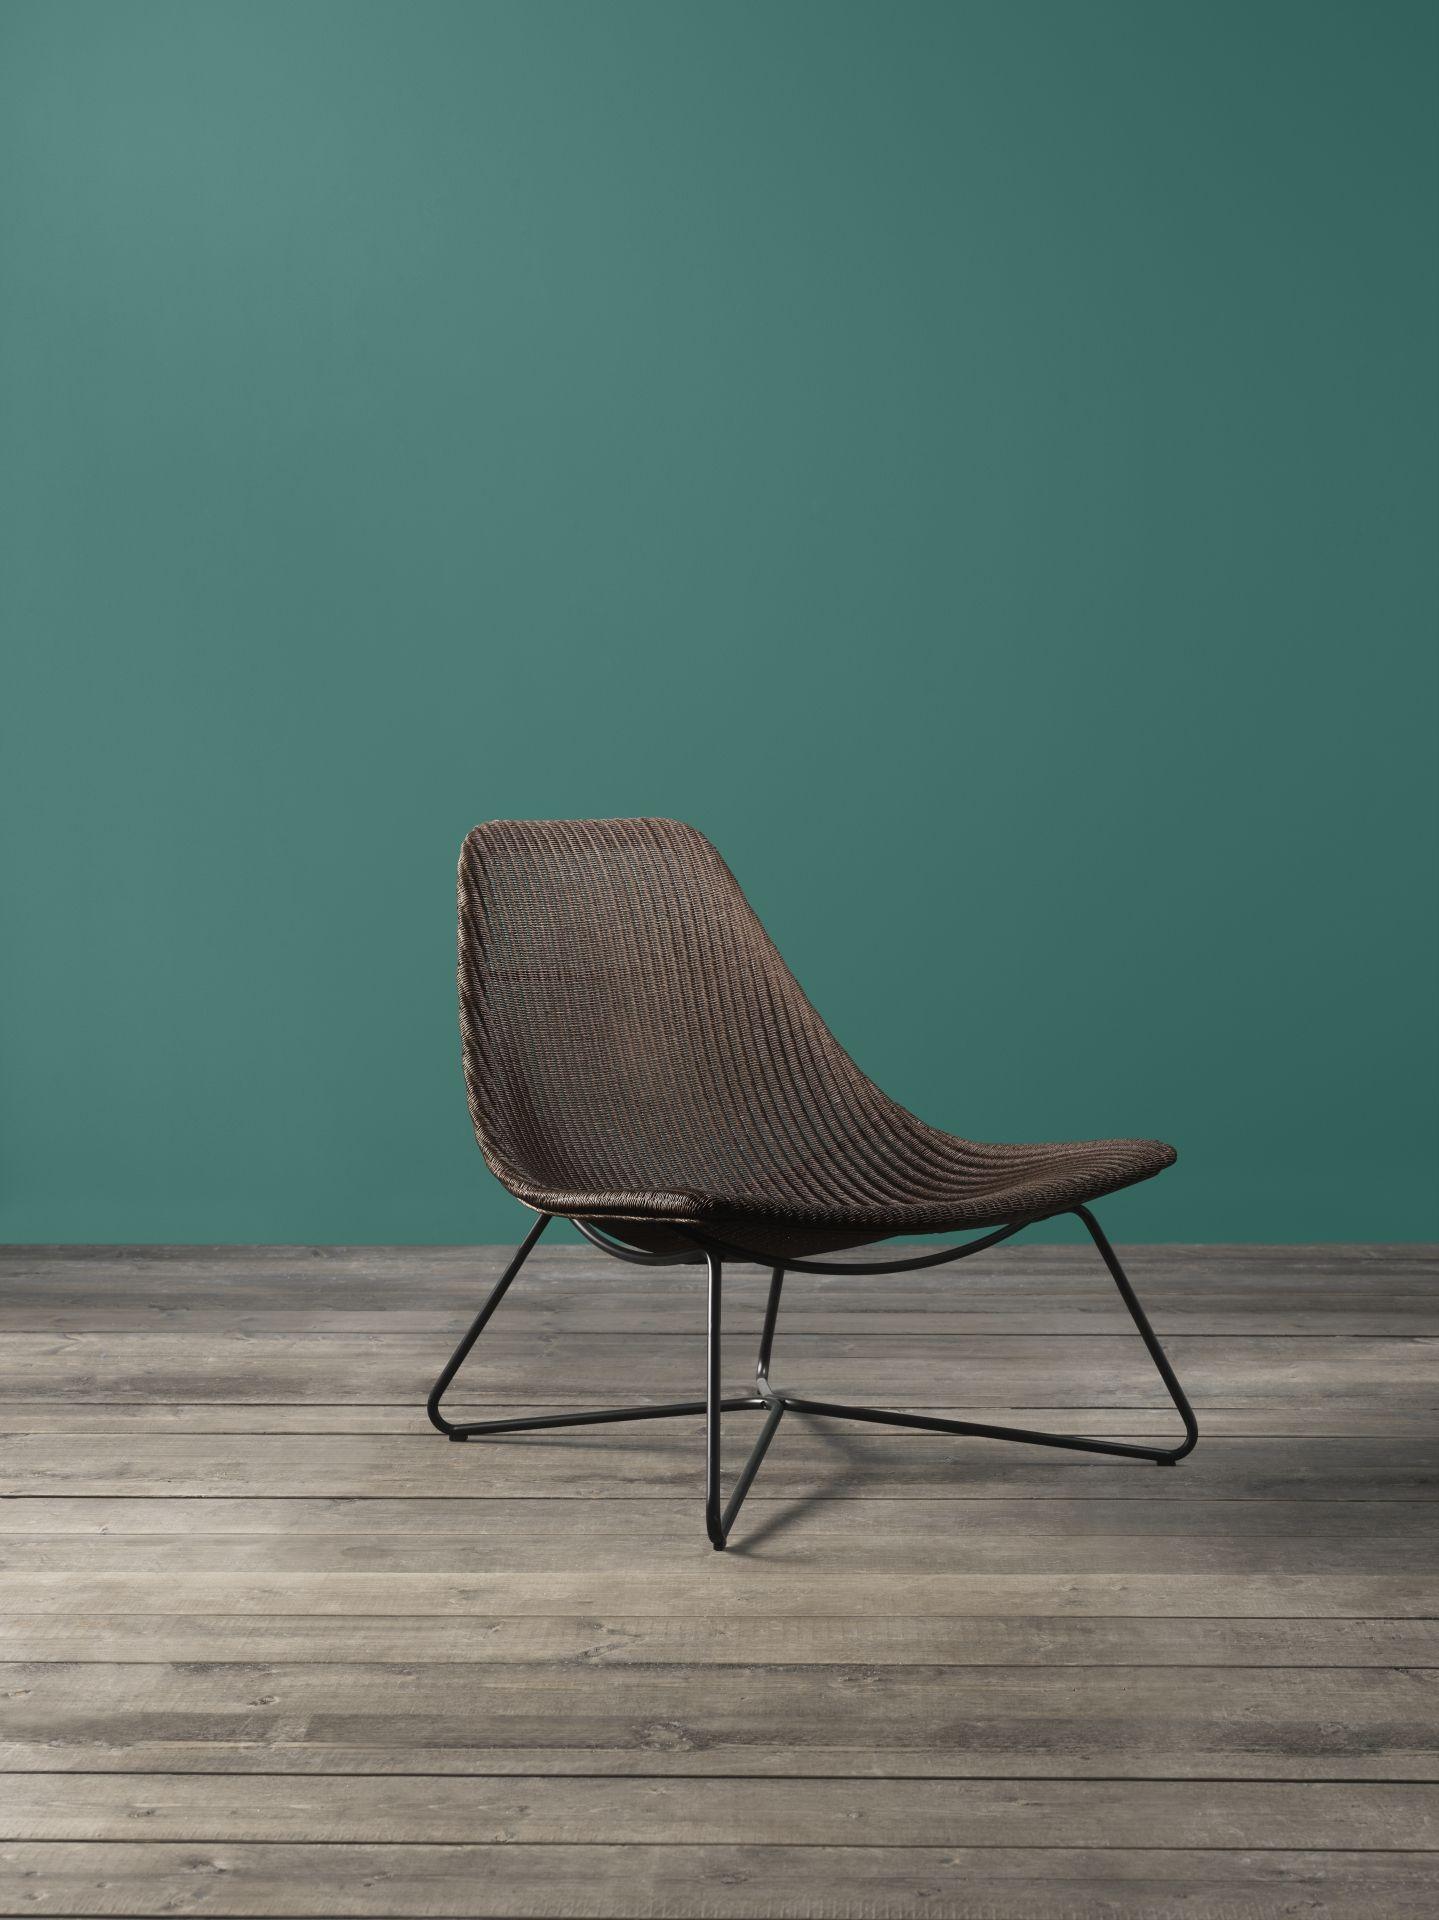 rdviken fauteuil ikeacatalogus nieuw 2018 ikea ikeanl ikeanederland stoel zwartbruin duurzaam lichtgewicht design natuurvezels ikea - Fauteuil Design Ikea